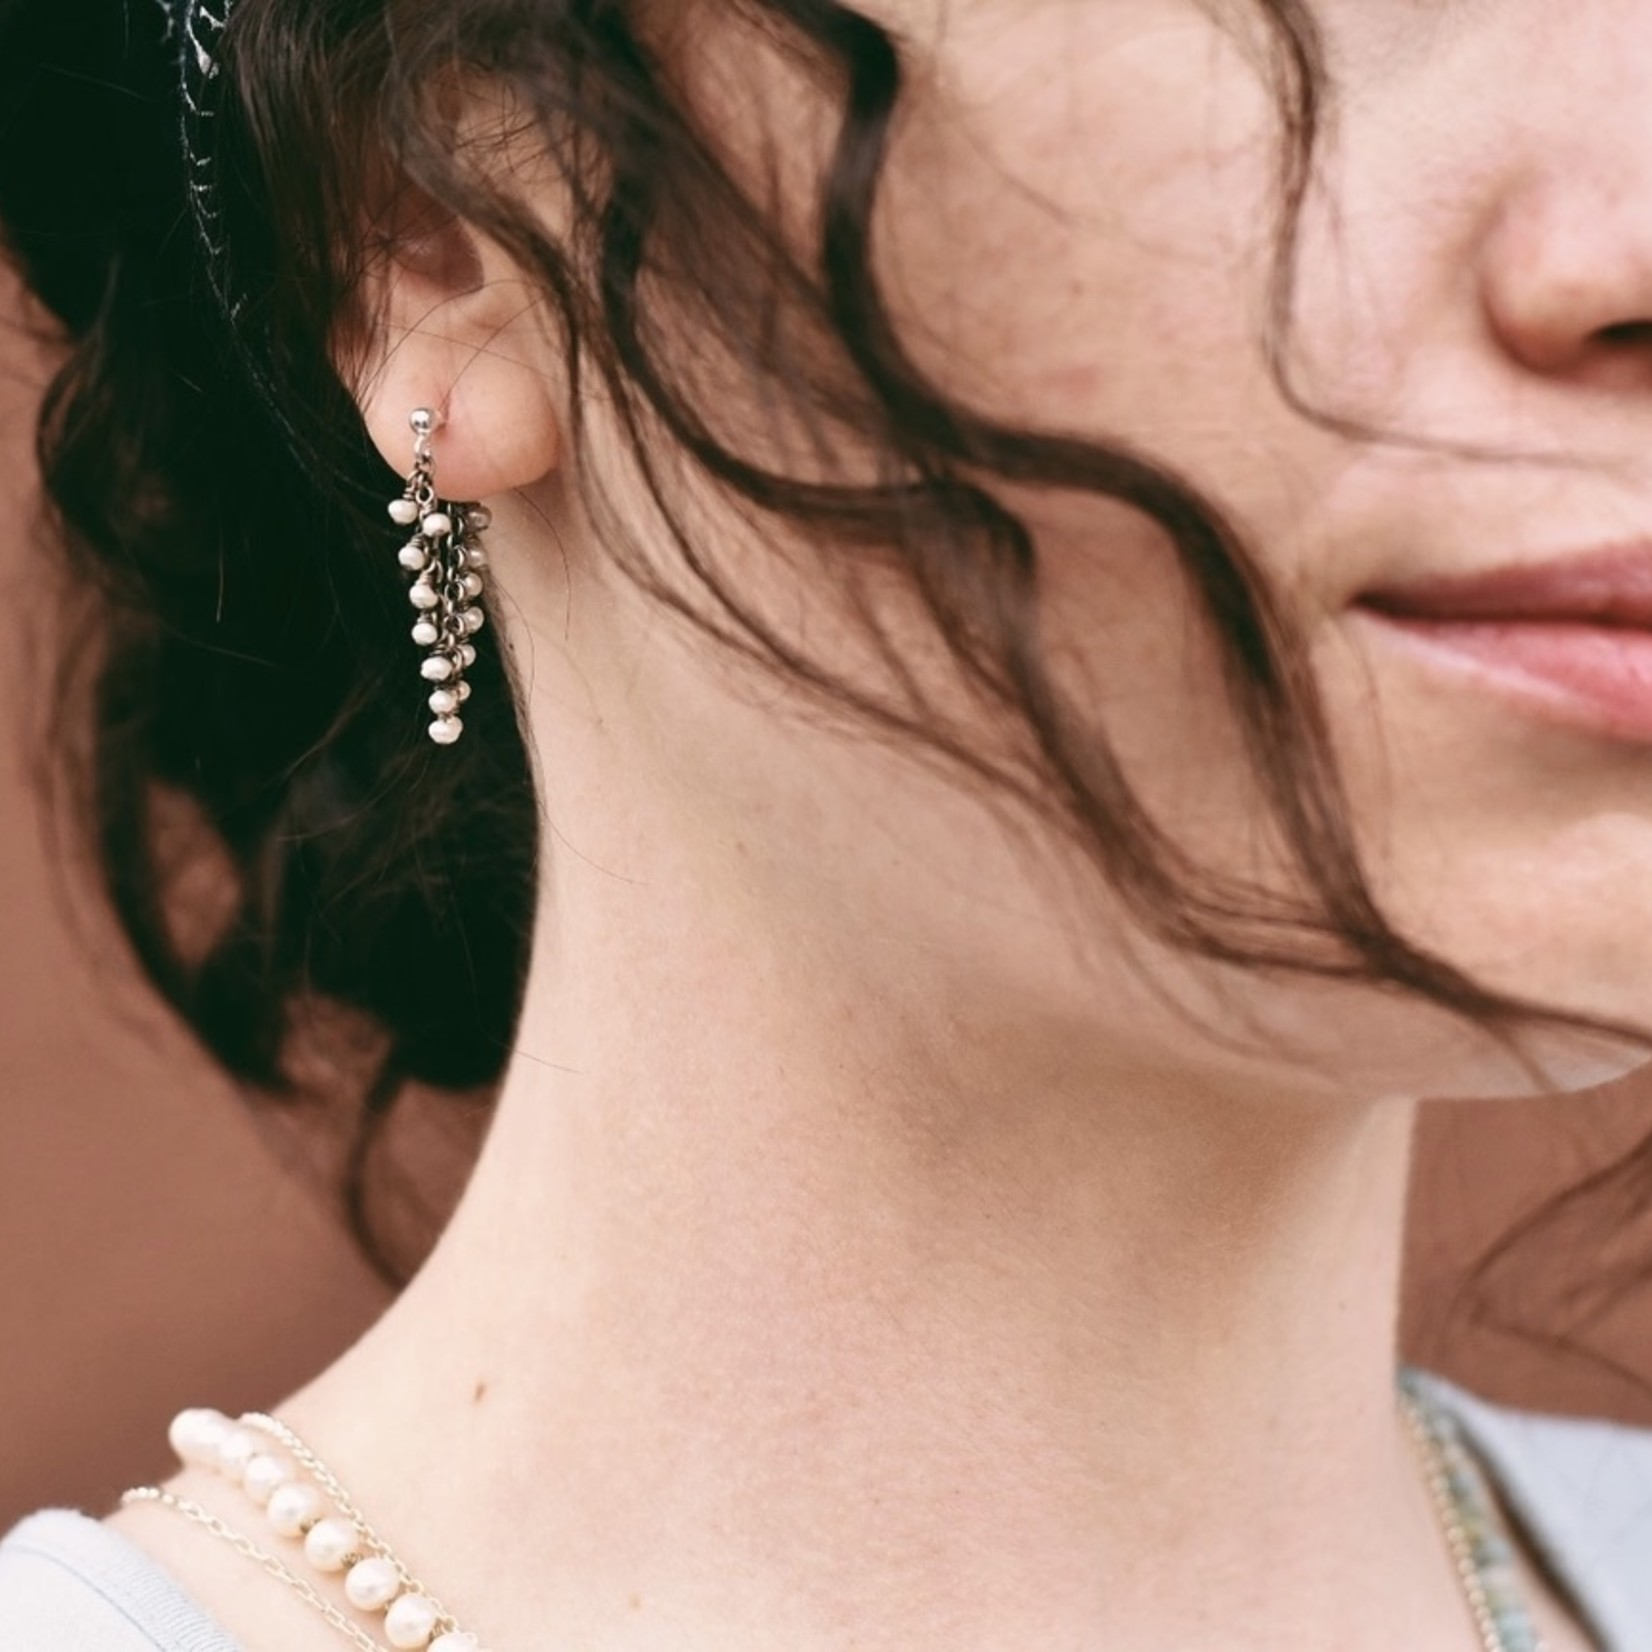 Handmade earrings with oxidized wrap around emerald